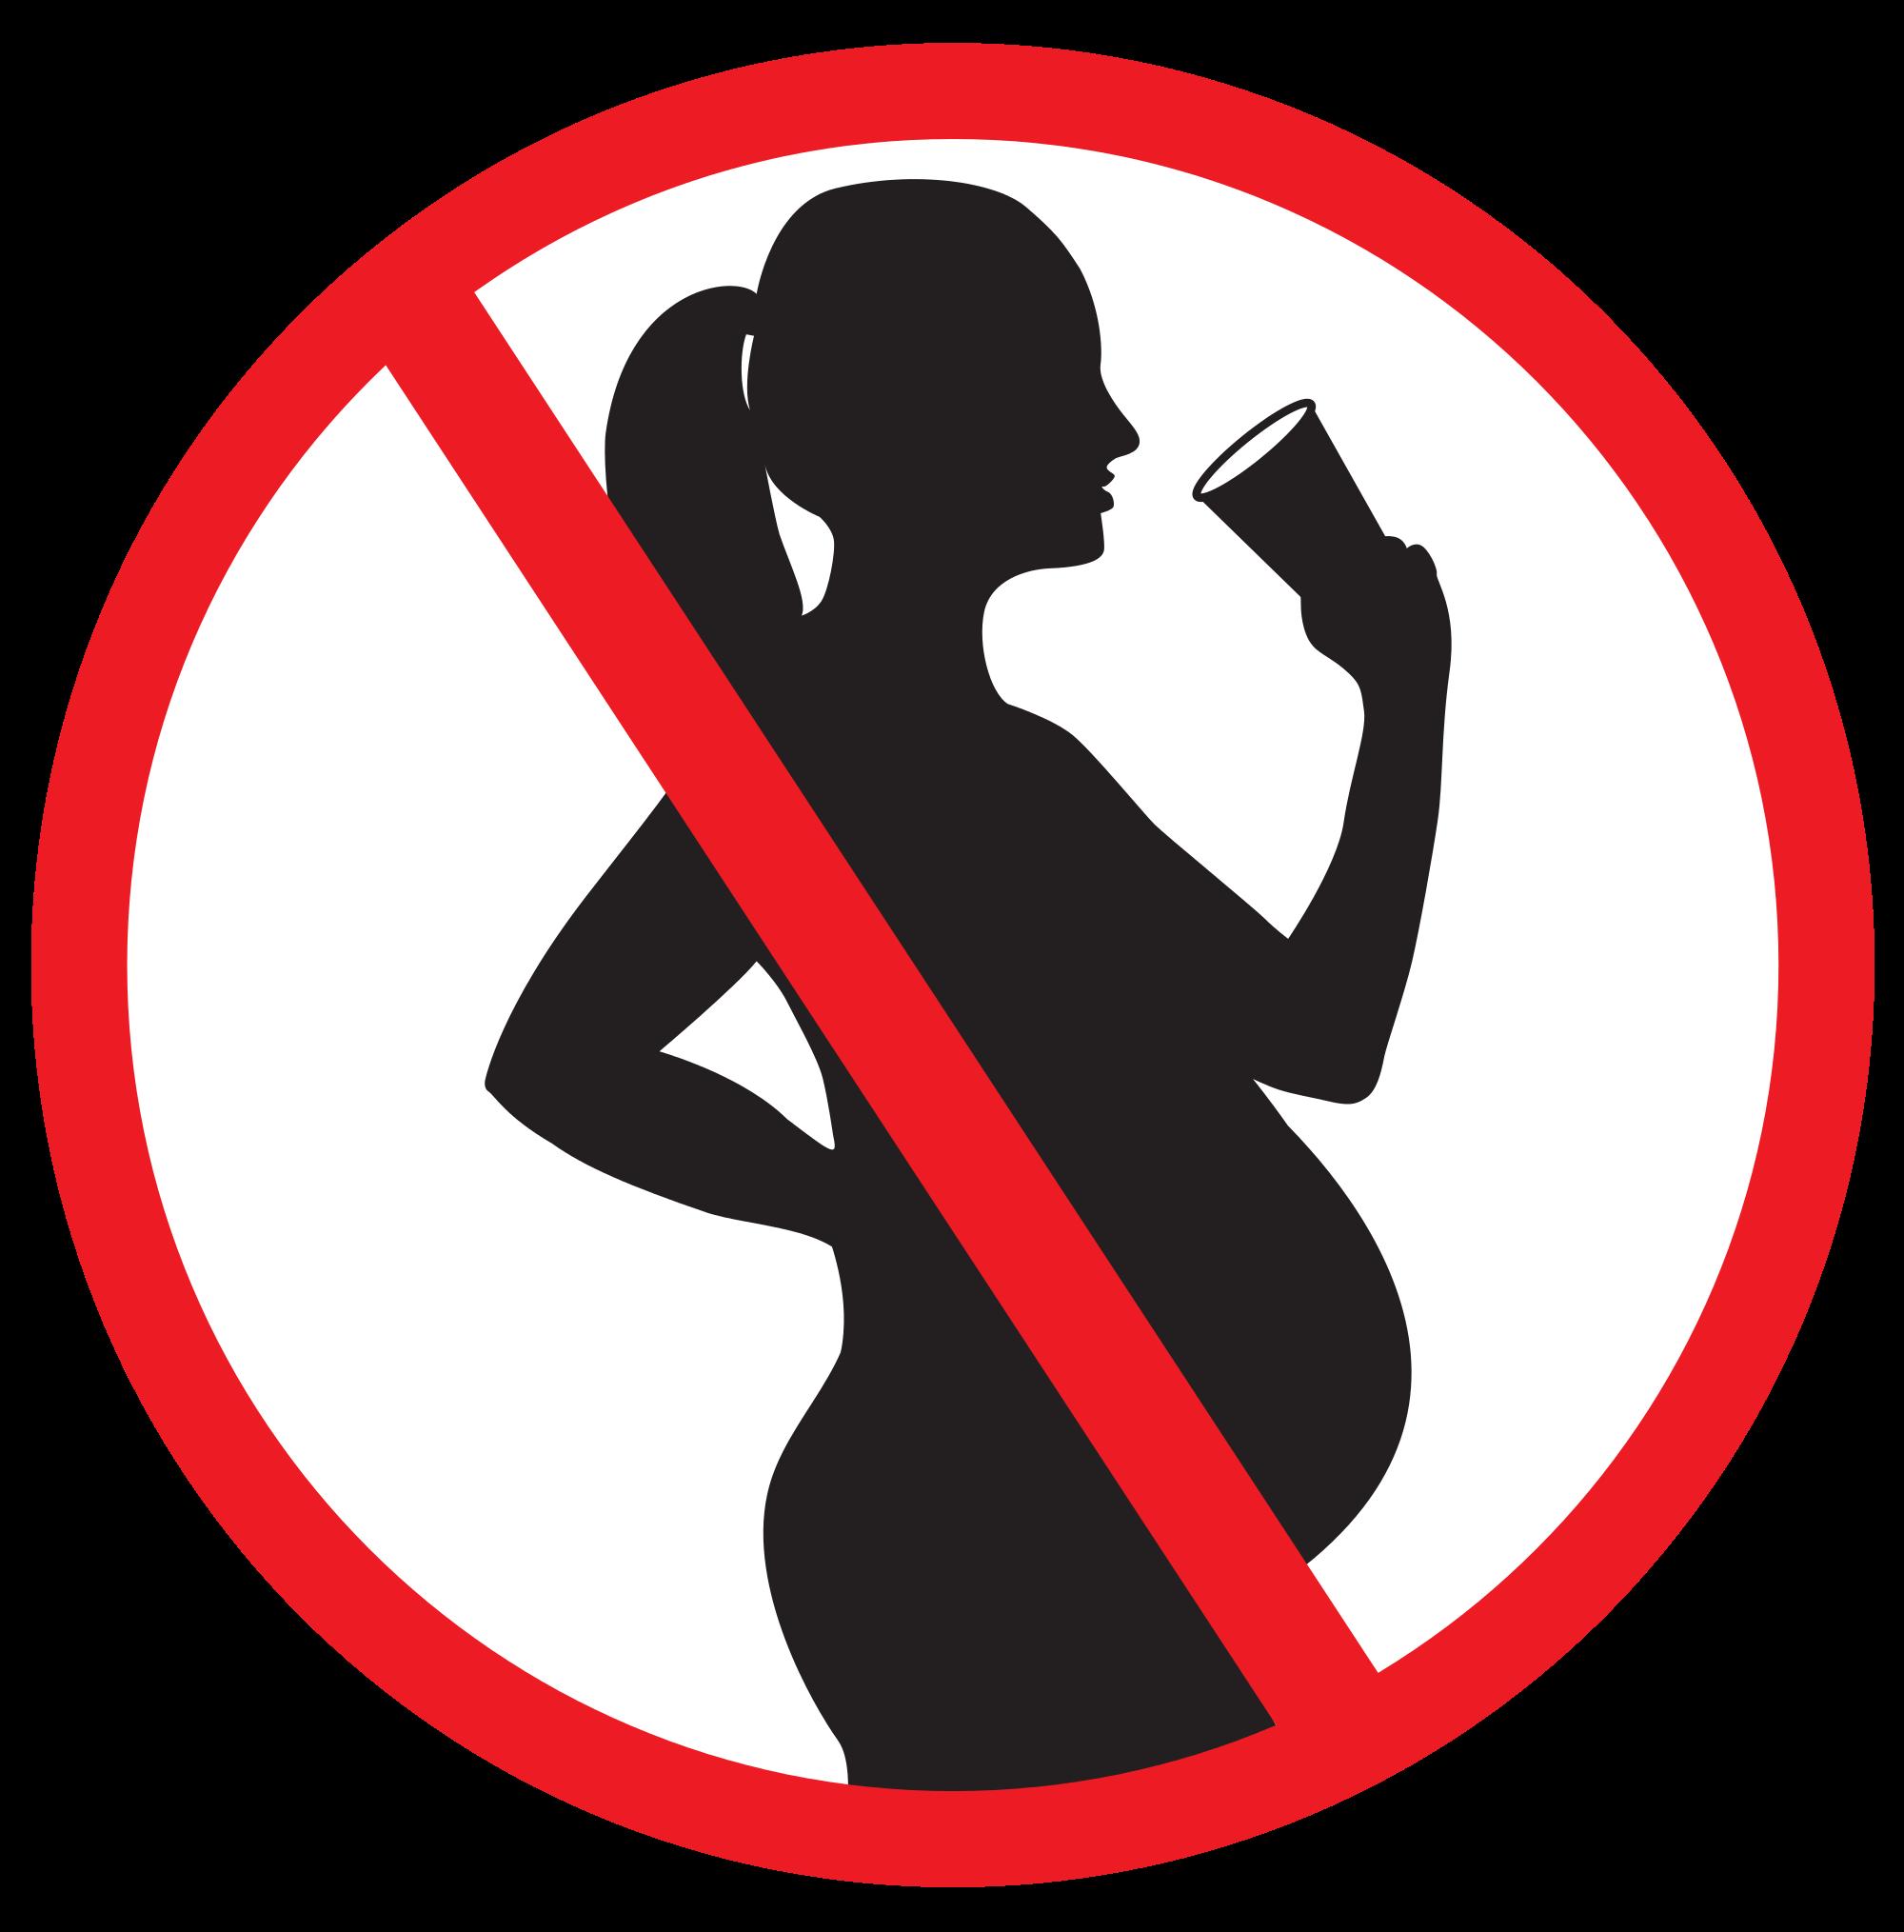 Uploads%2f1484944756076 79e54iue5asgrbh5 de9f9701b3694a389e17ada439a7da6d%2fz%c3%a9ro+alcool+pendant+la+grossesse